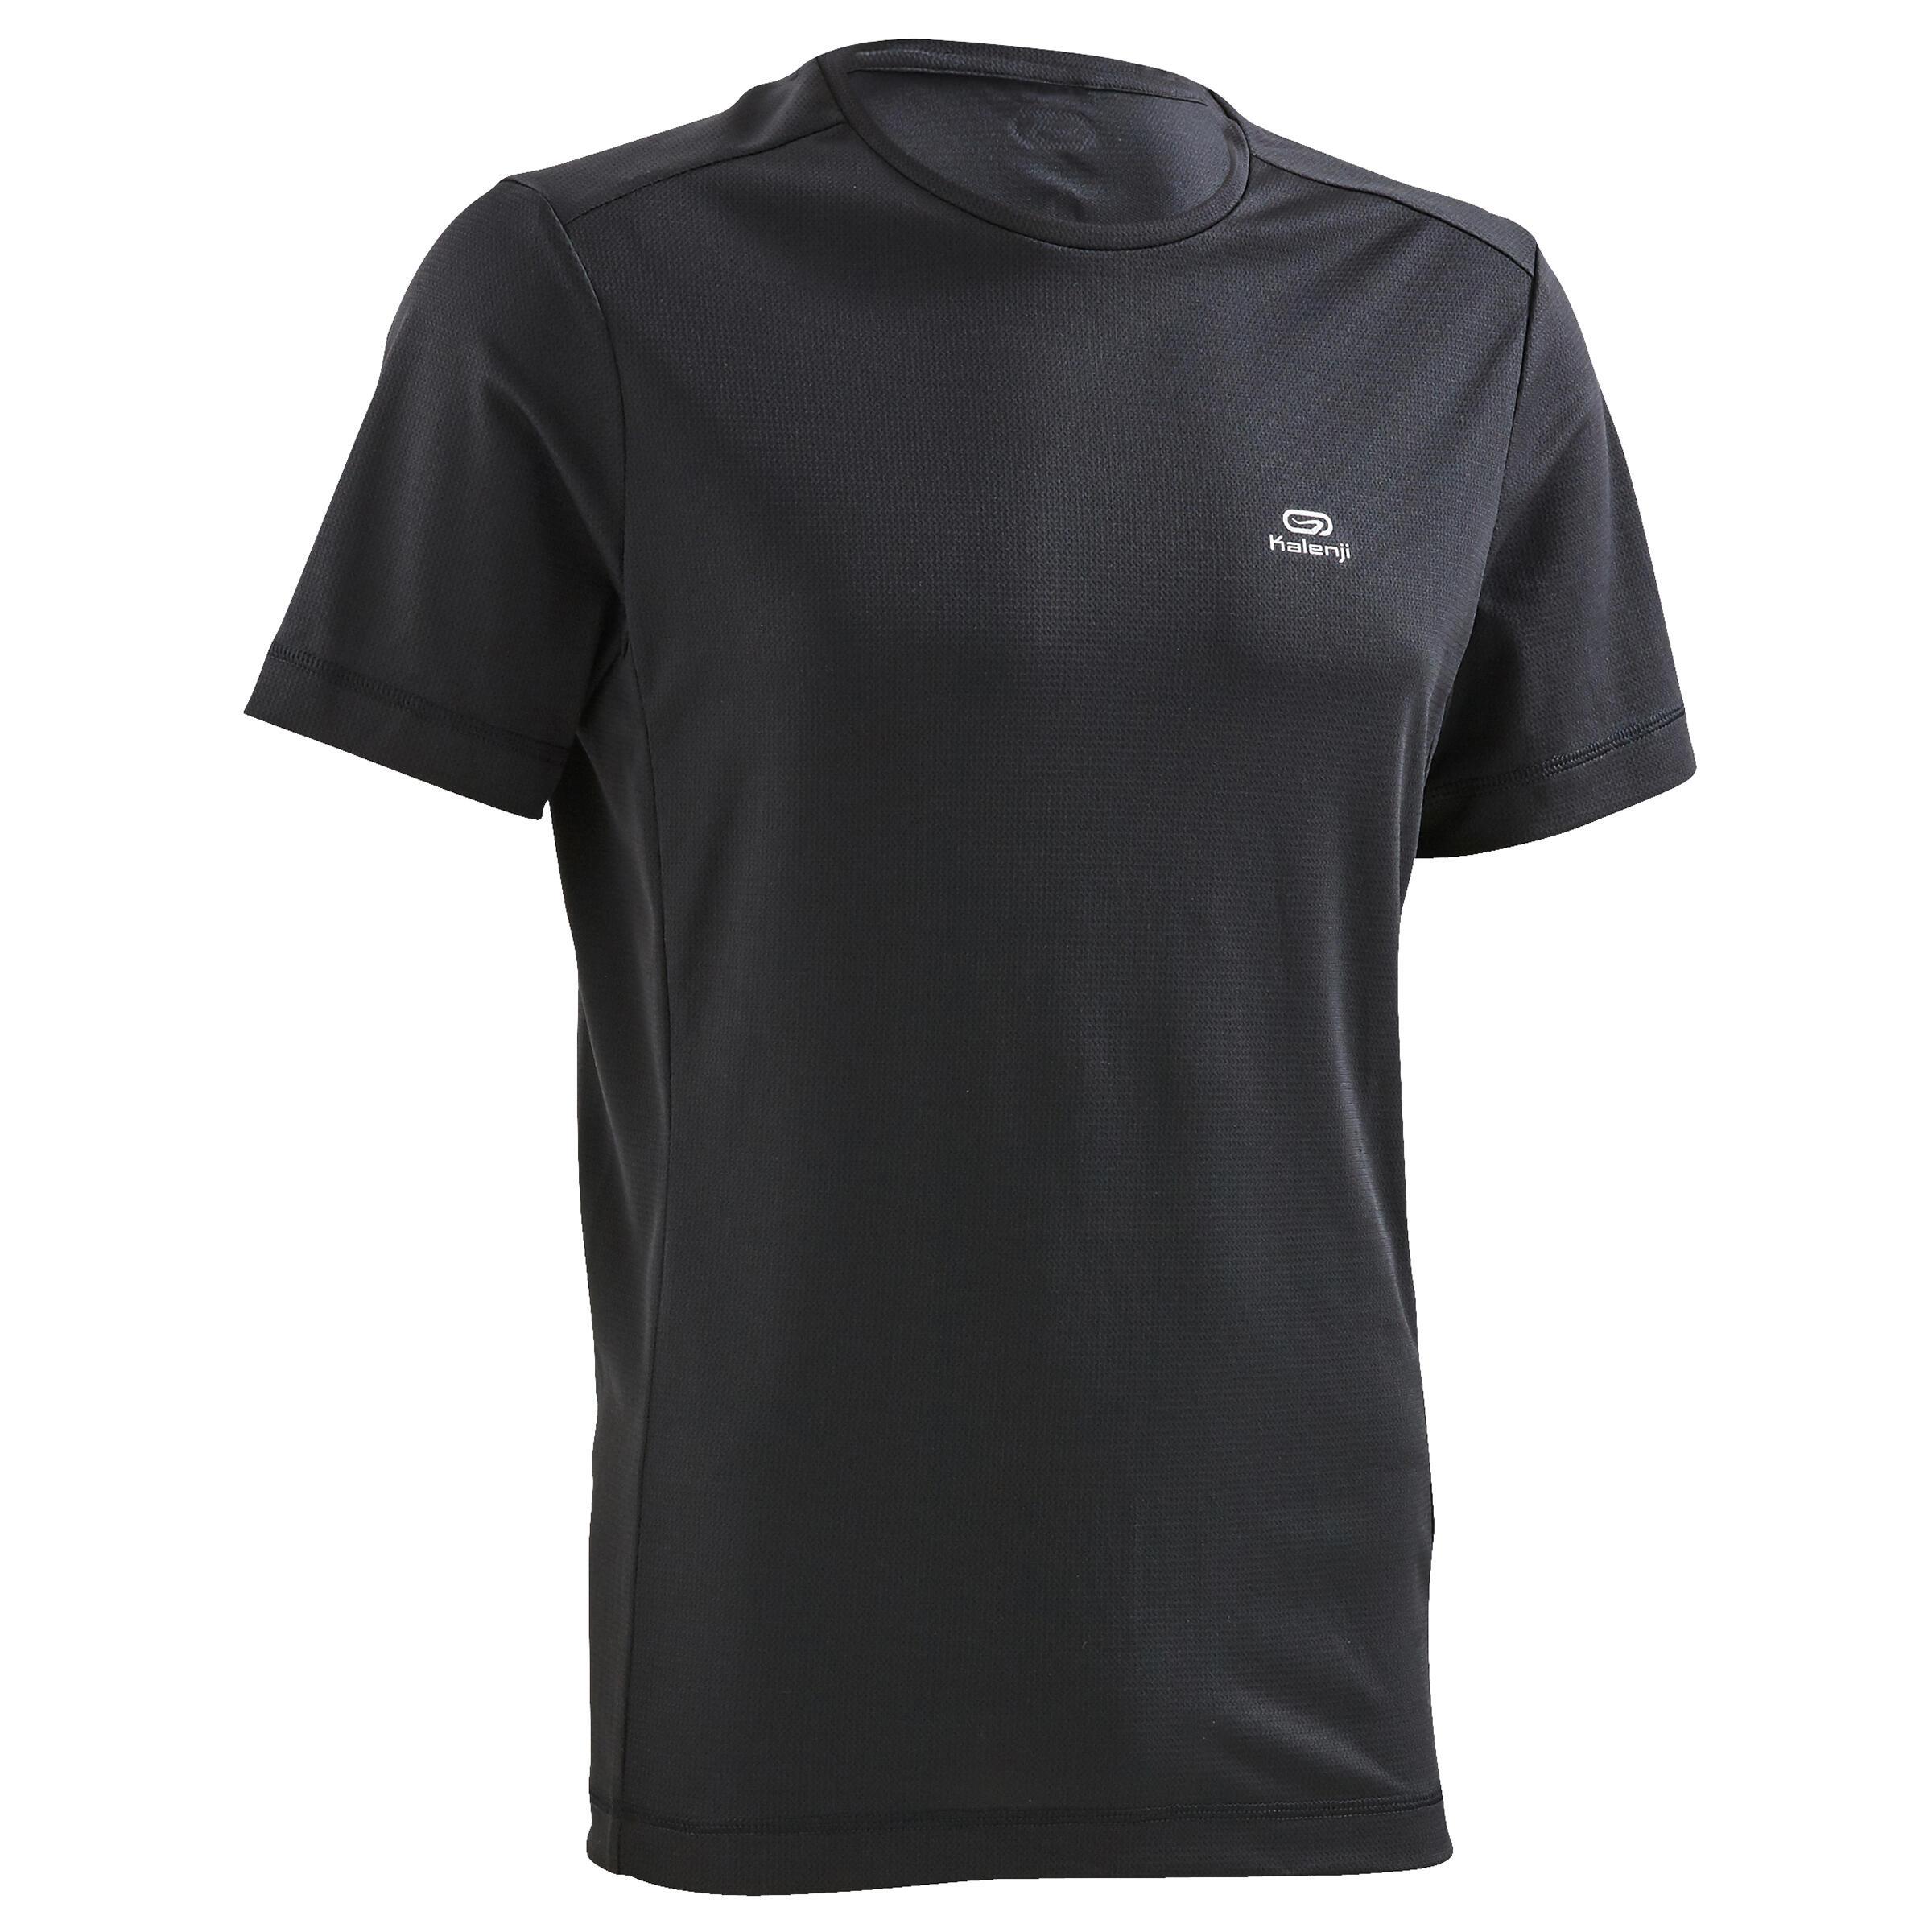 Laufshirt Run Dry Herren | Sportbekleidung > Sportshirts > Laufshirts | Kalenji